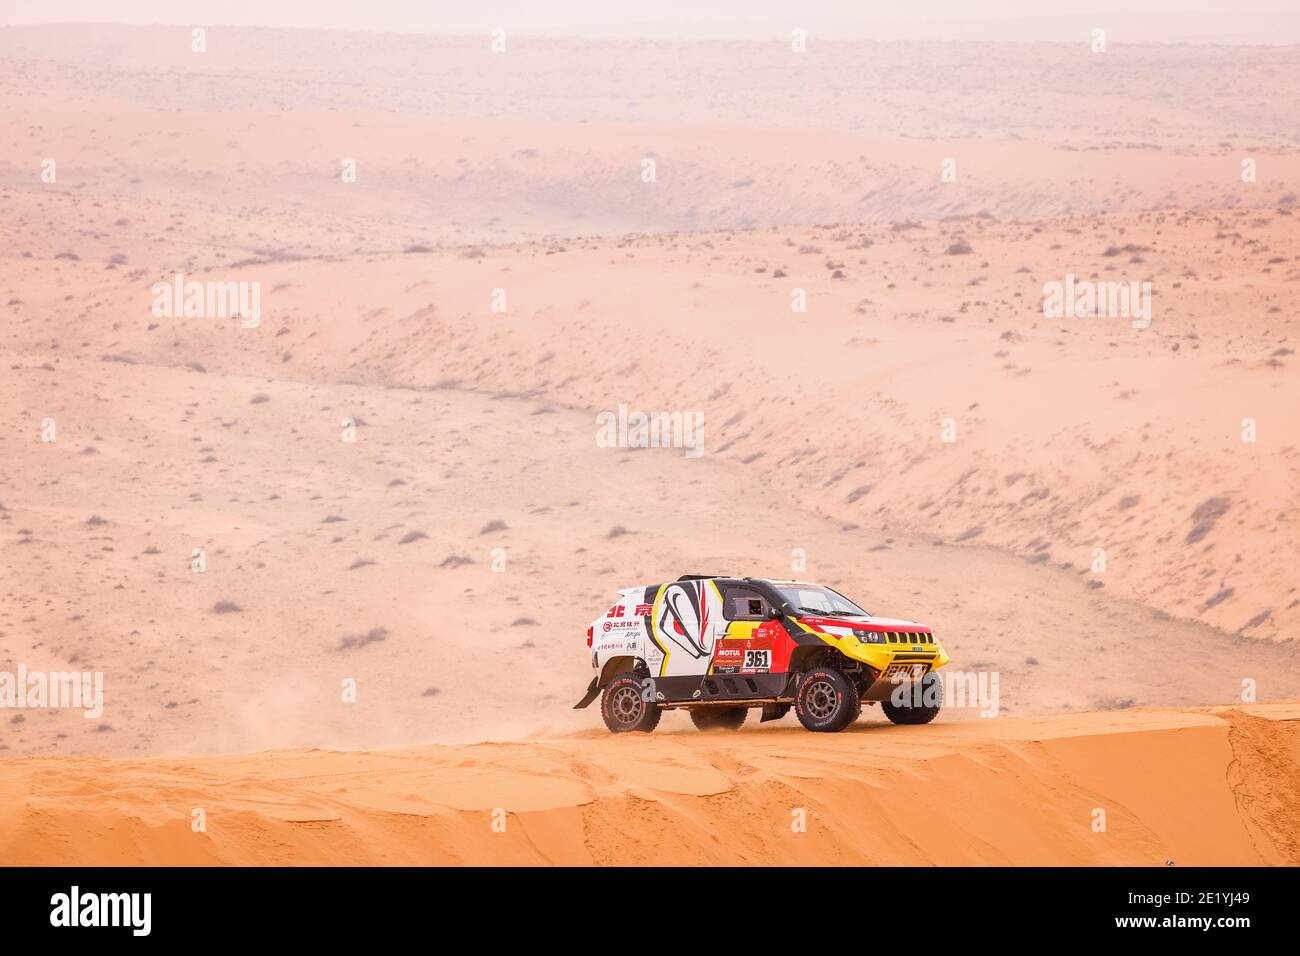 Dakar et rally-raid - Page 12 361-lu-binglong-chn-ma-wenke-chn-baic-baic-orv-auto-action-during-the-7th-stage-of-the-dakar-2021-between-hail-and-sakaka-in-saudi-arabia-on-january-10-2021-photo-frdric-le-floch-dppi-lm-2E1YJ49